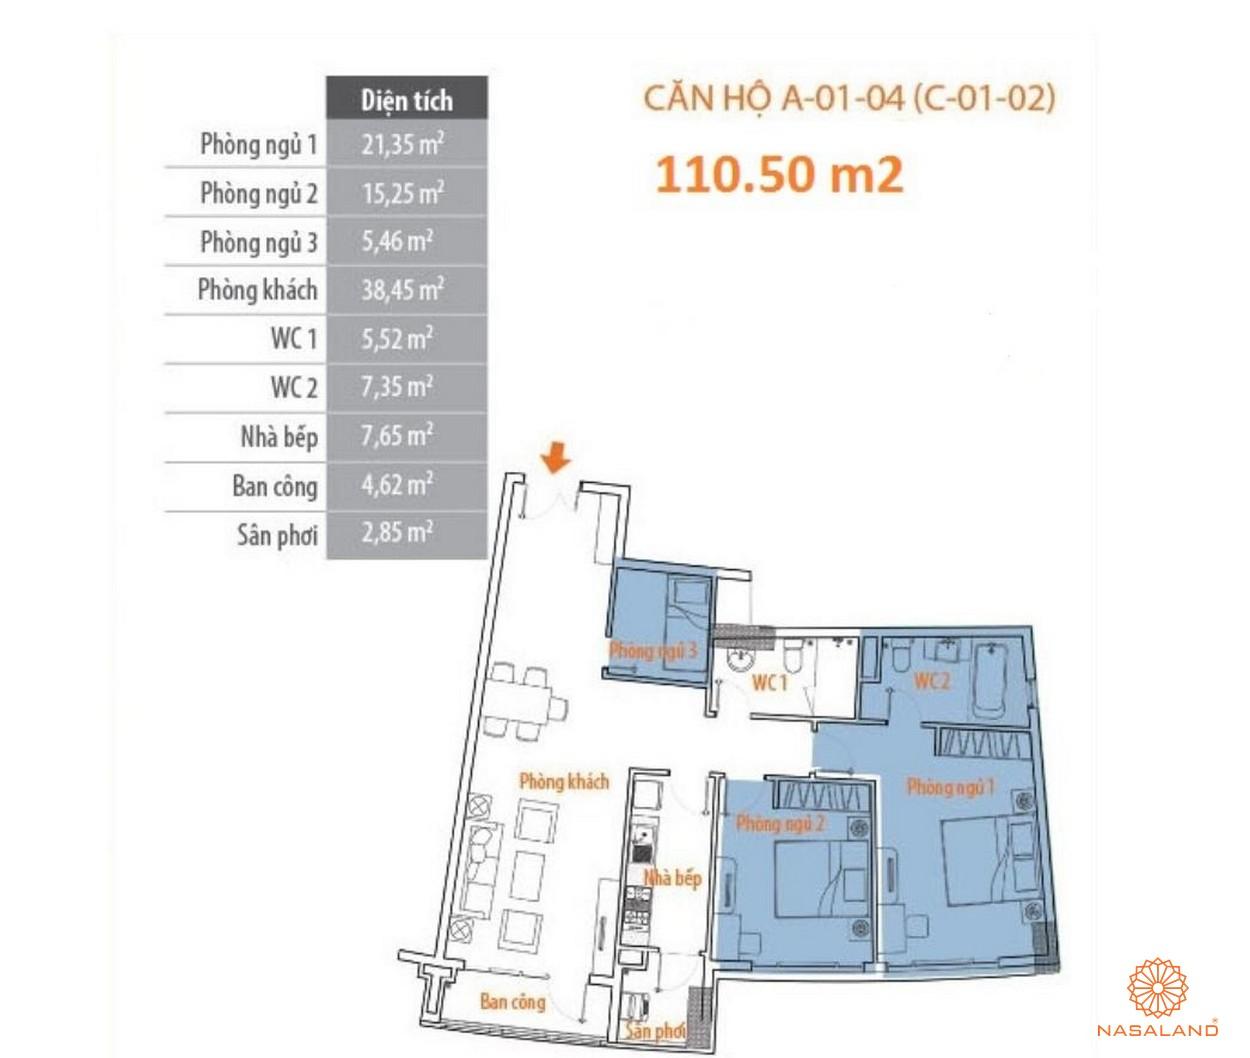 Thiết kế tổng quan căn hộ Him Lam Riverside quận 7 - block A căn số 04